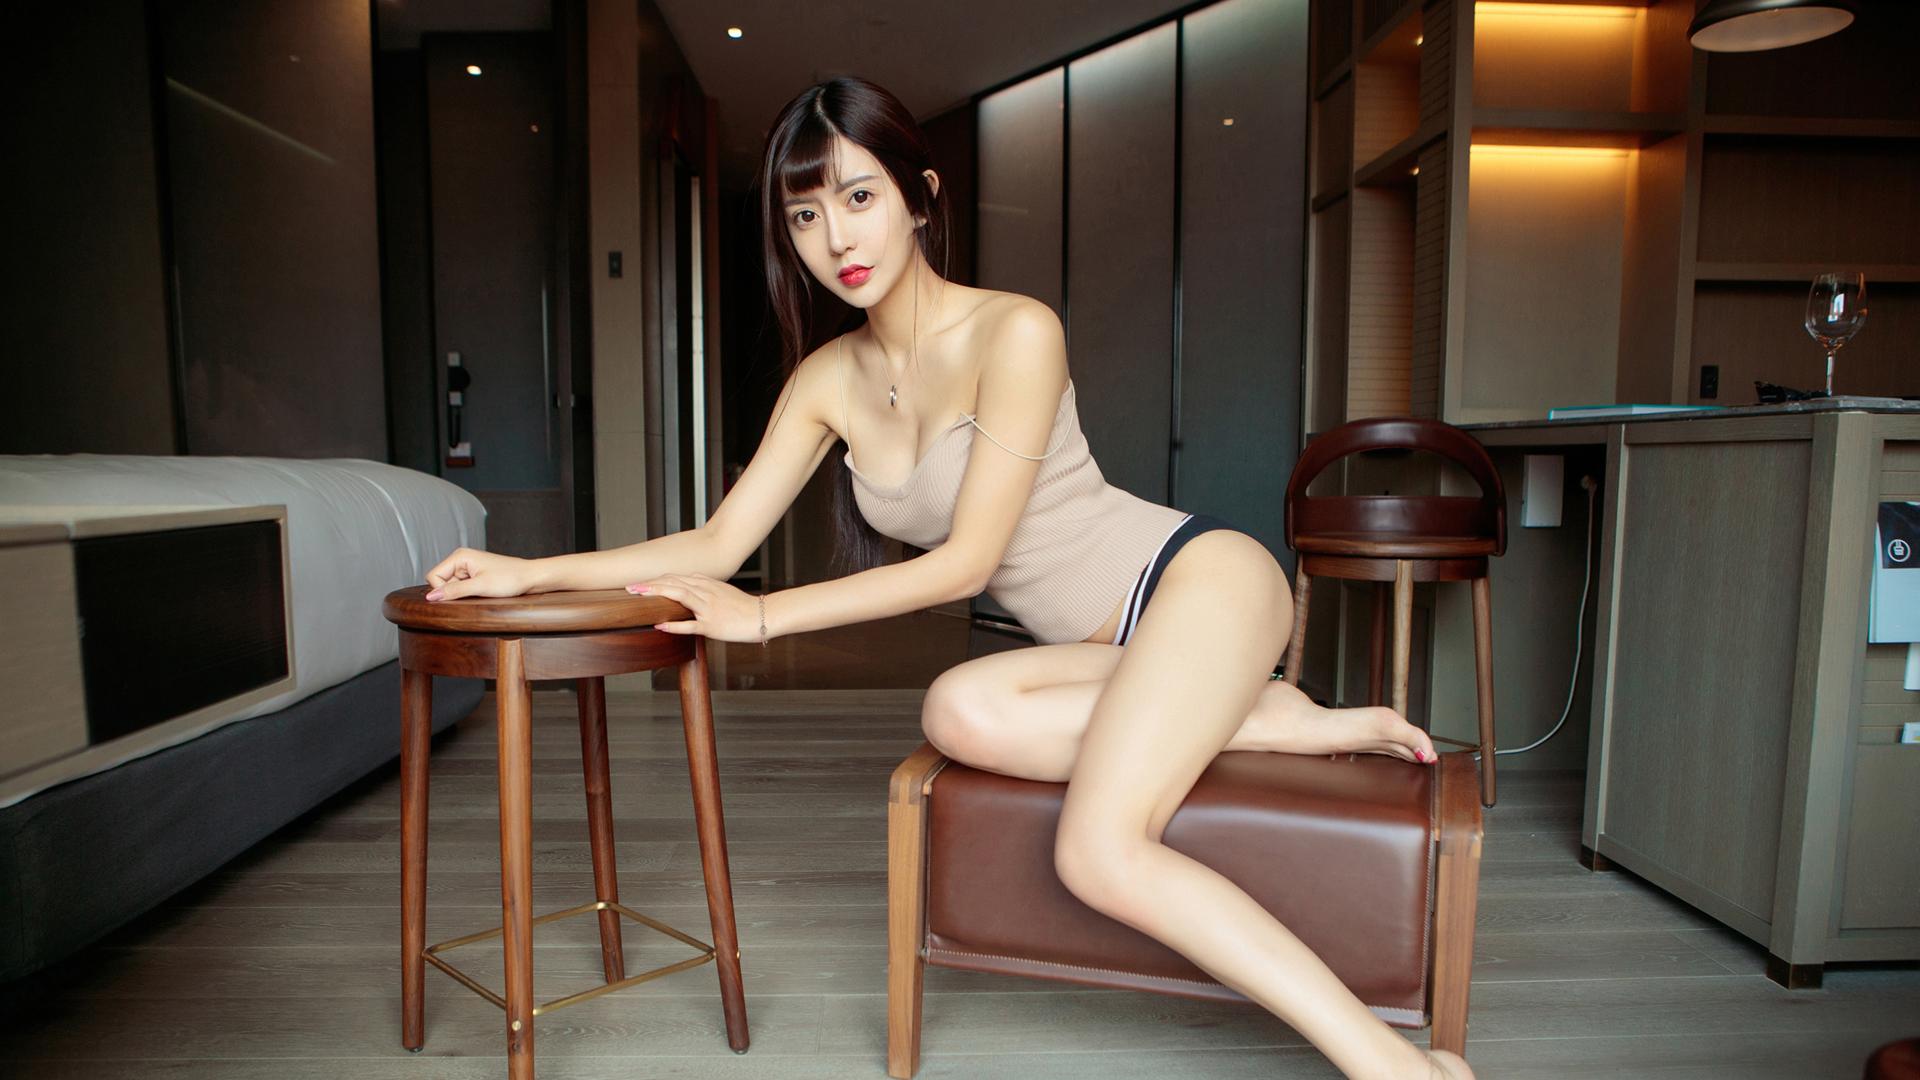 People 1920x1080 women model photography Asian Zhao Zhi Yan legs necklace women indoors chair lipstick bare shoulders